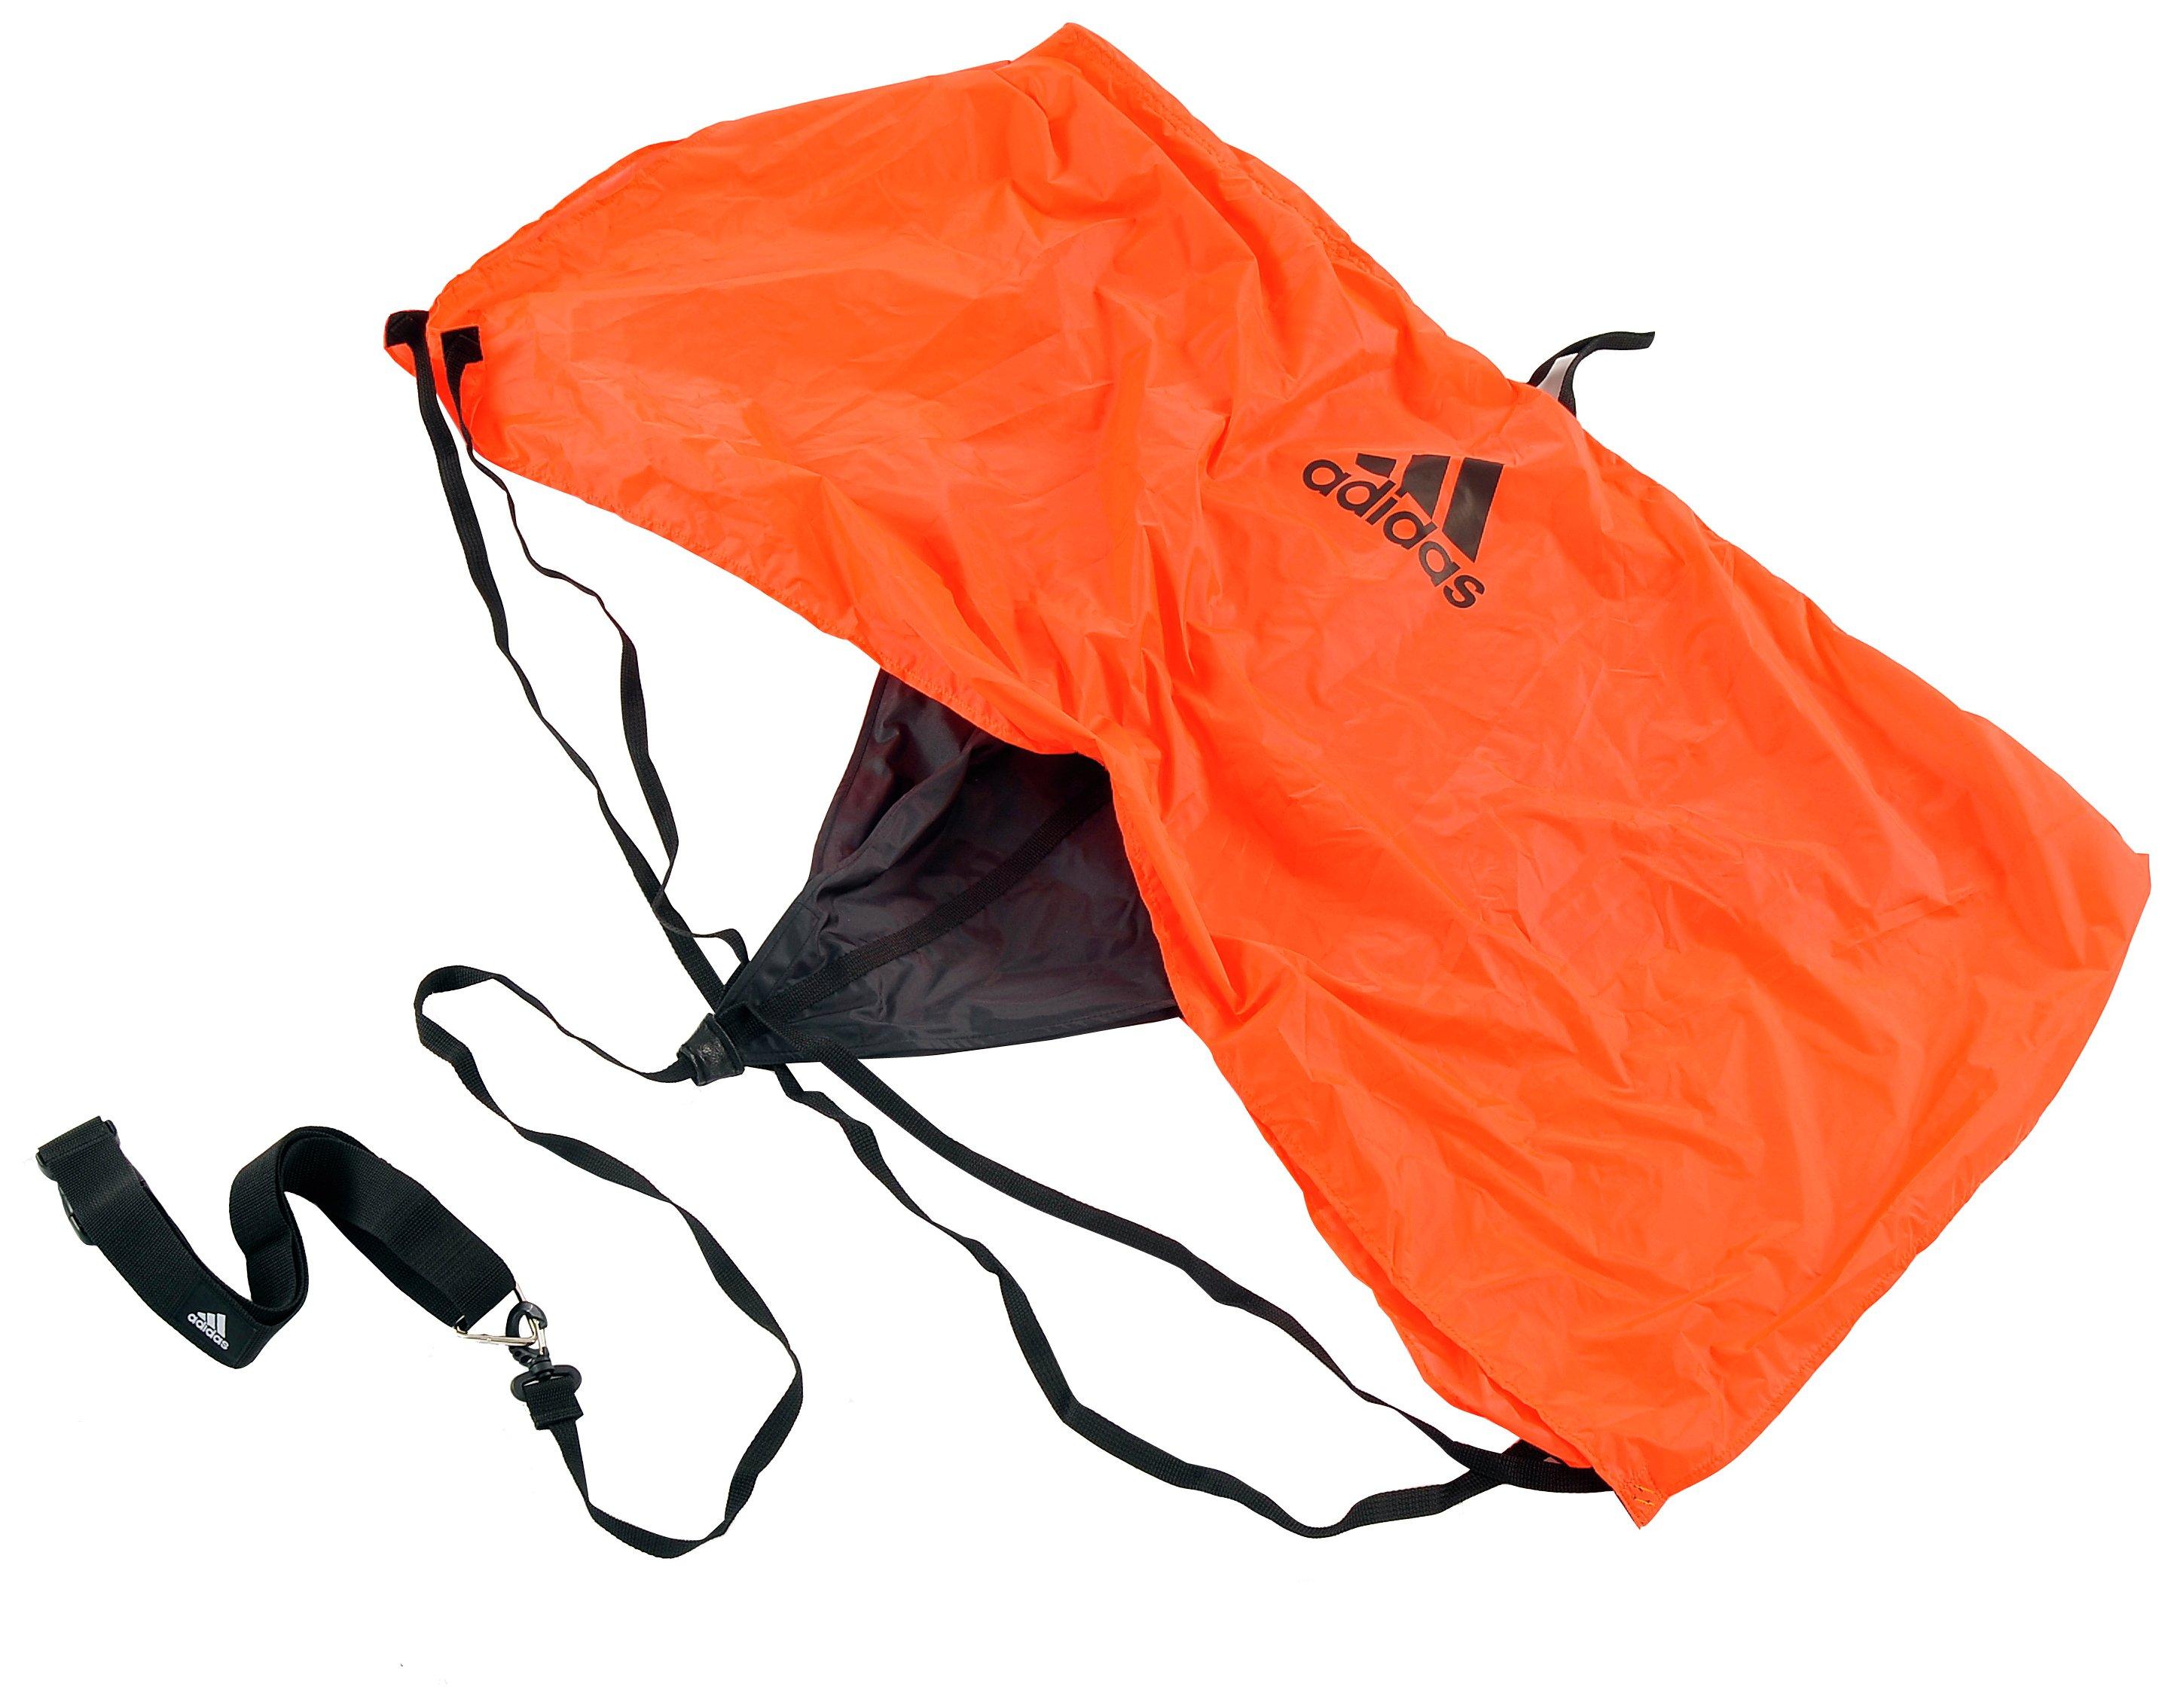 Adidas Resistance Parachute.